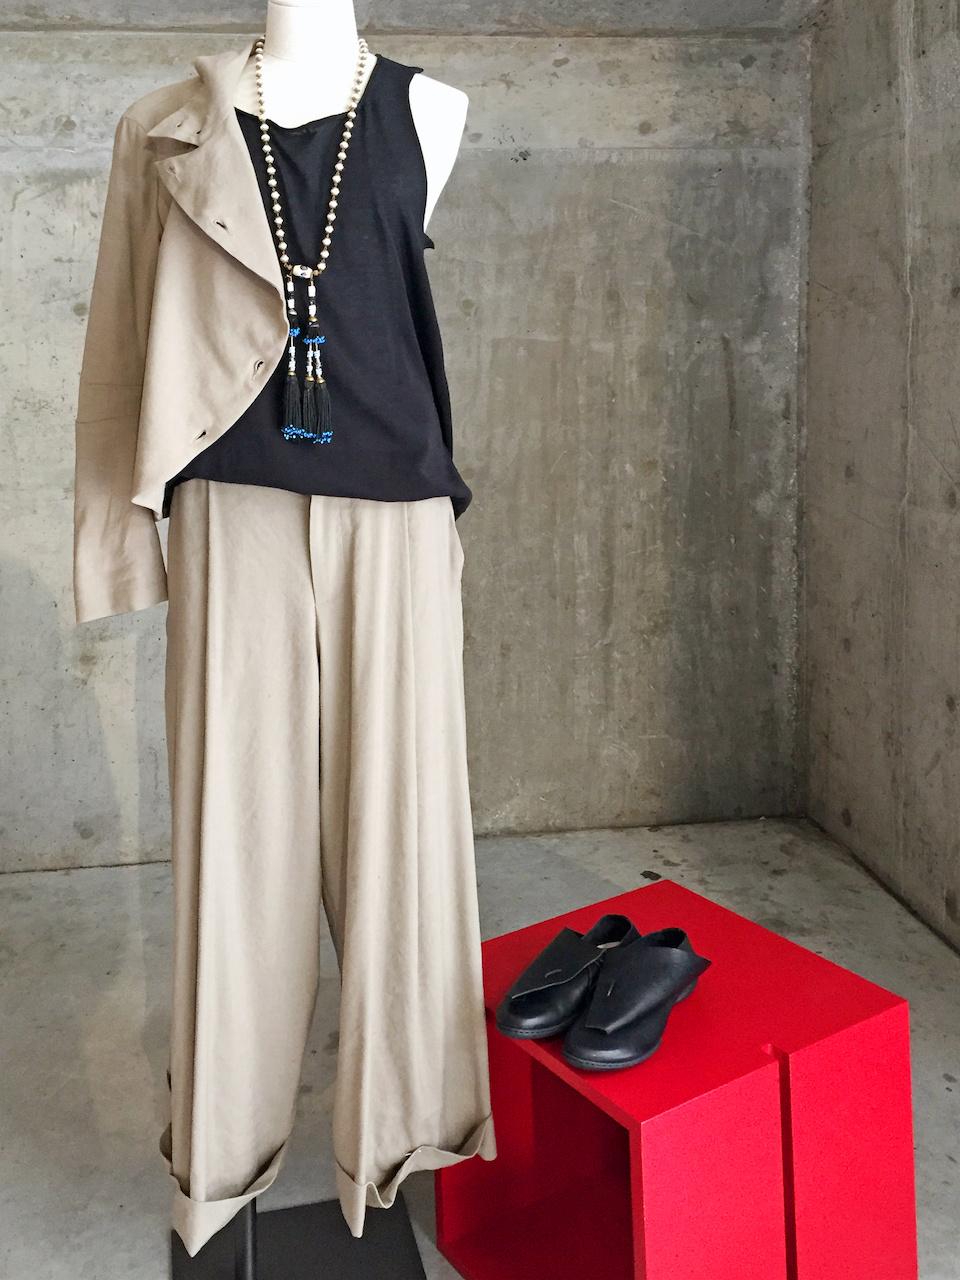 Lilith pant suit StyleBlueprint Atlanta